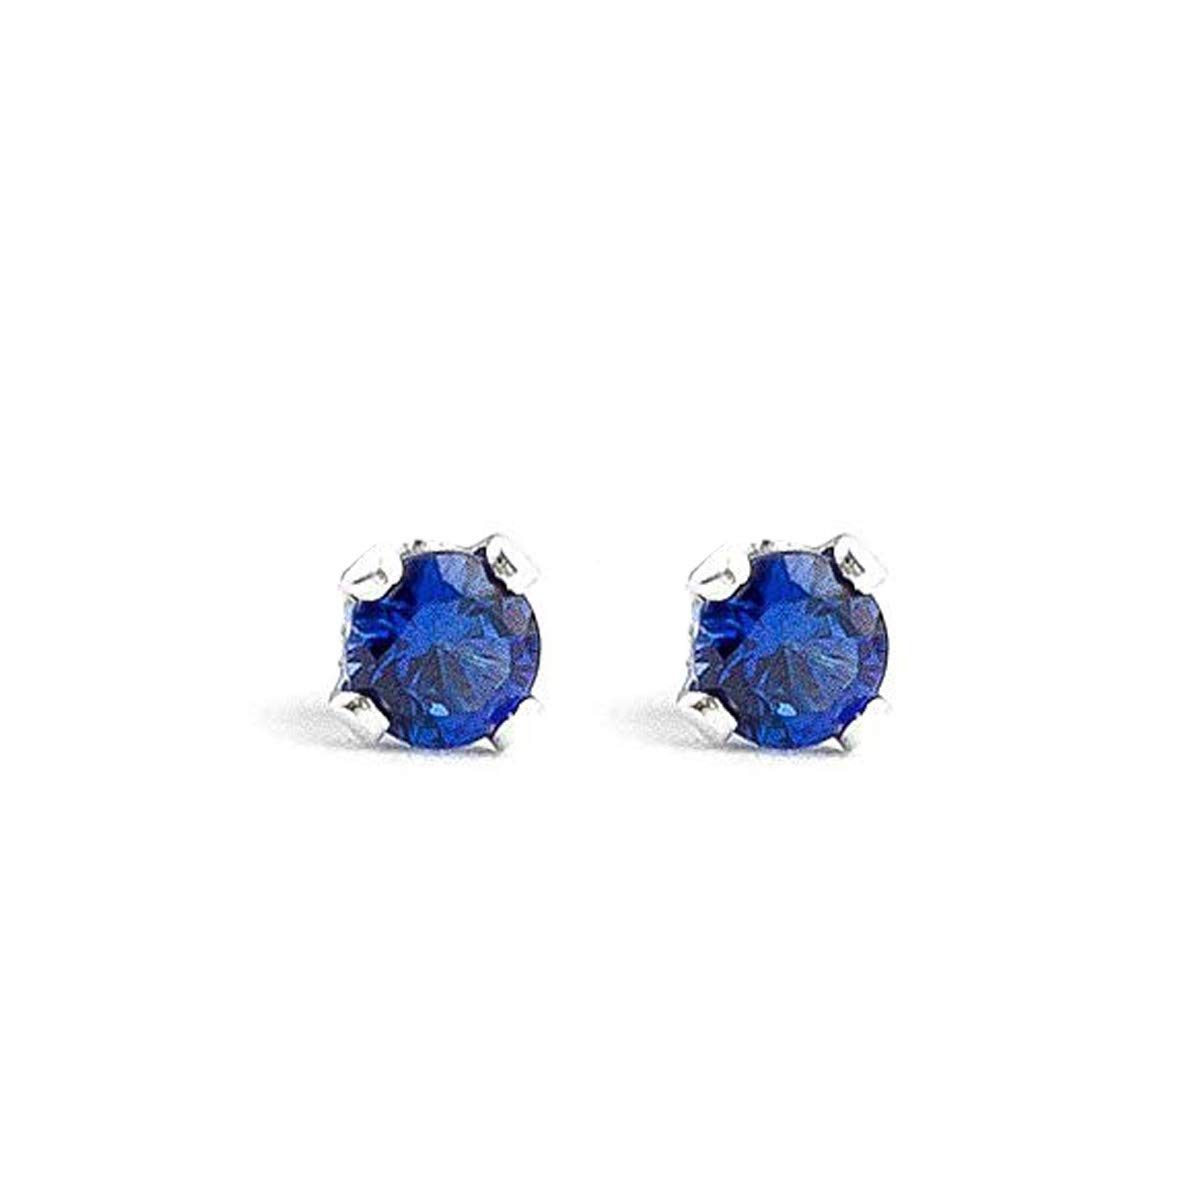 3mm Tiny Blue Sapphire Gemstone Stud Earrings in Sterling Silver - September Birthstone